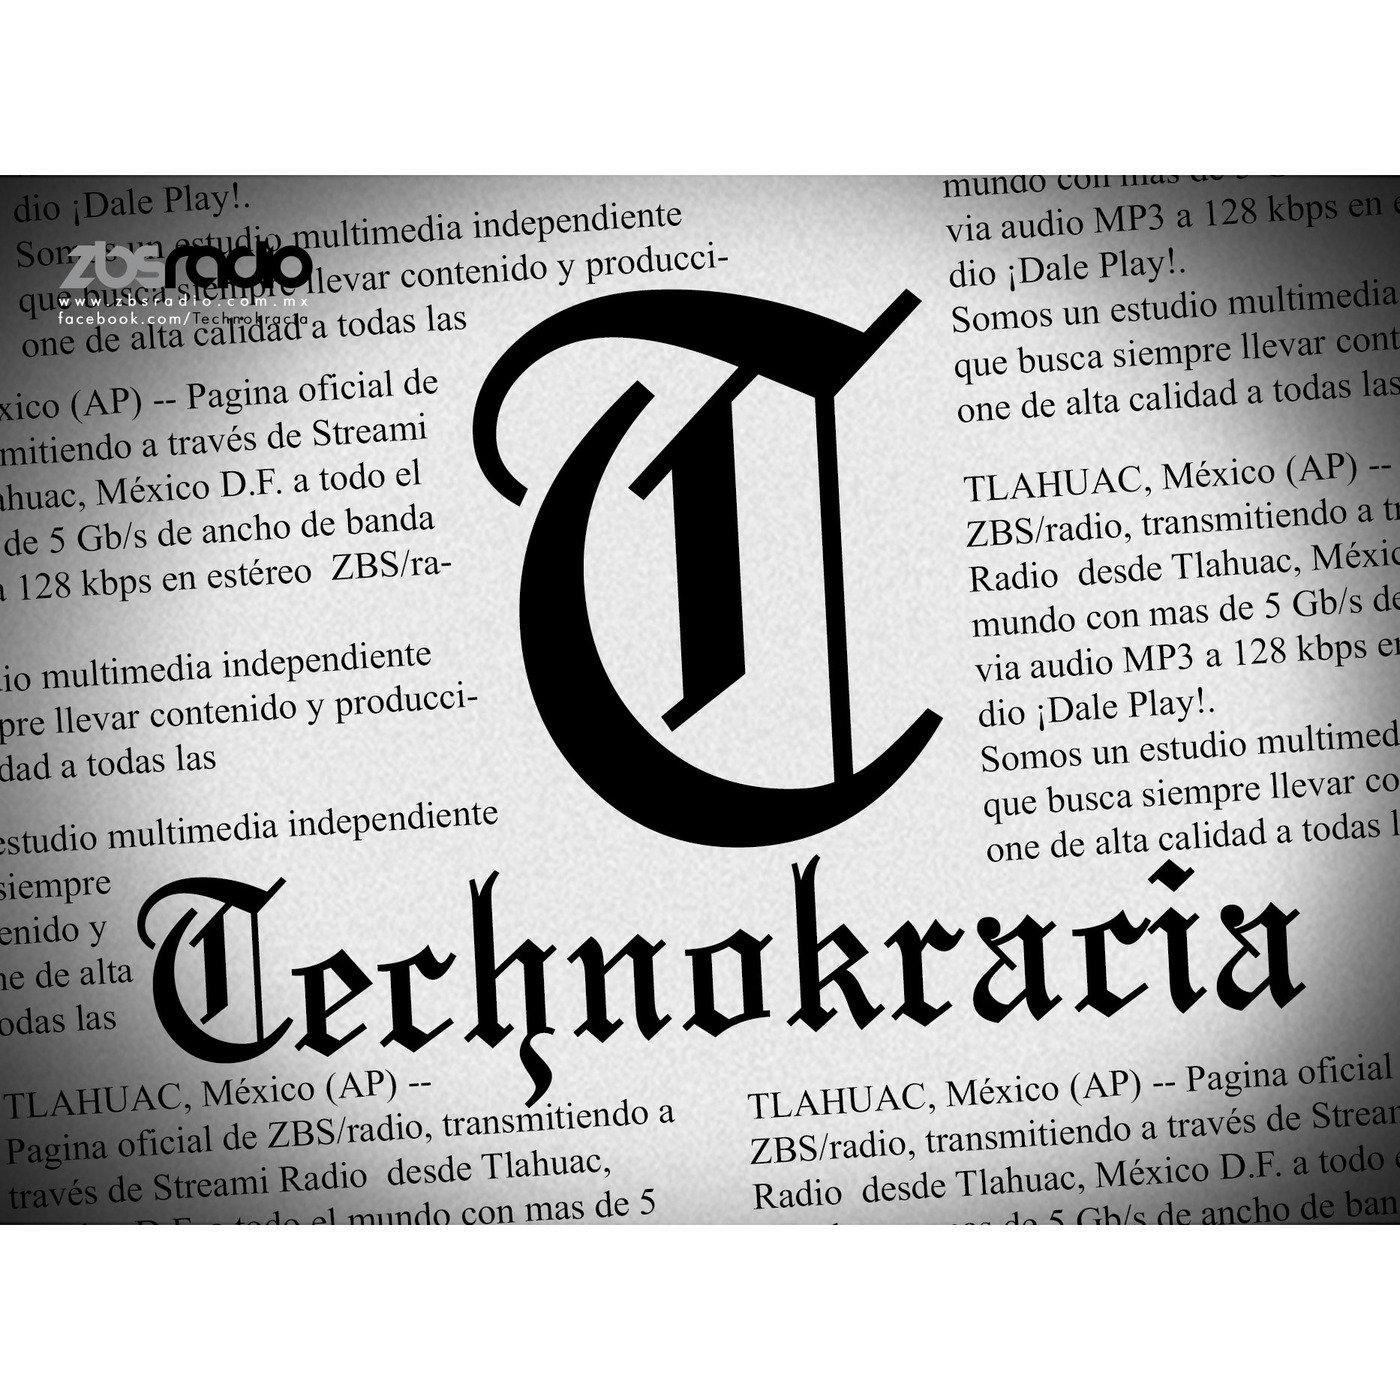 <![CDATA[Technokracia]]>